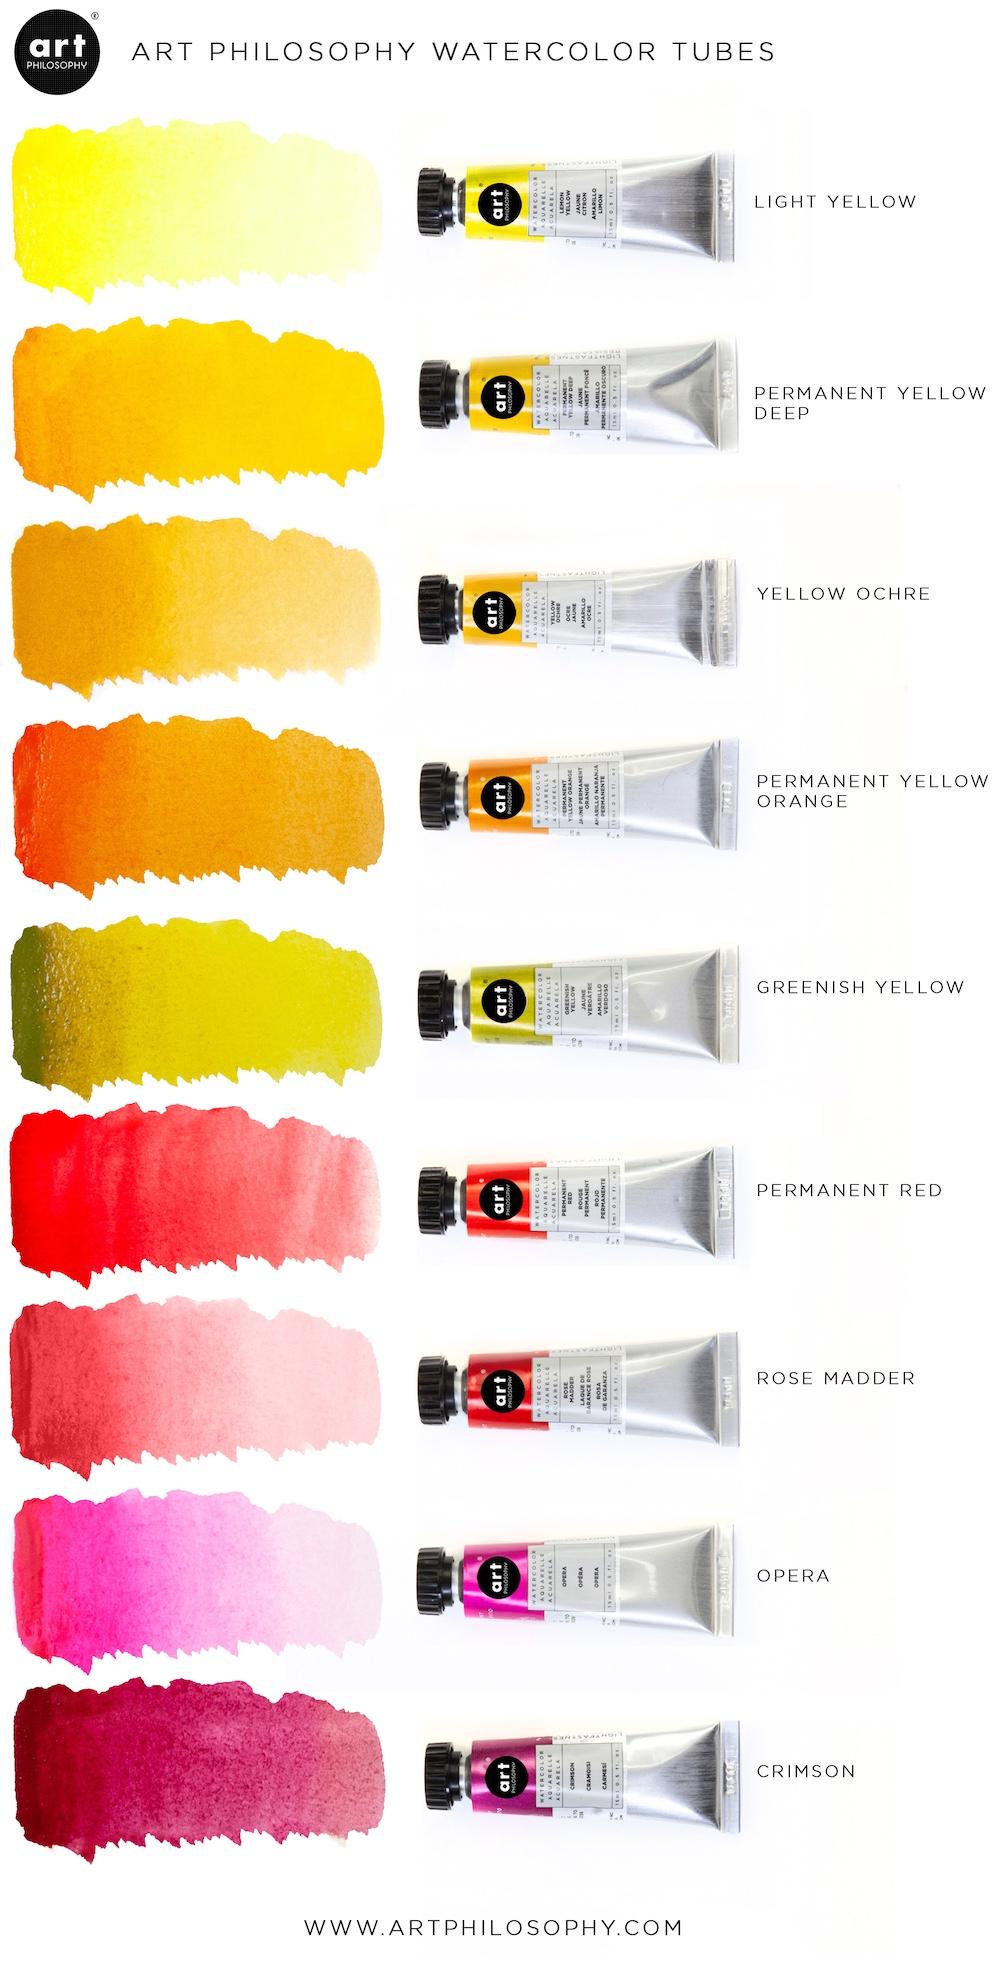 Art Philosophy® Artist Grade Watercolor Tubes - Permanent Yellow Orange